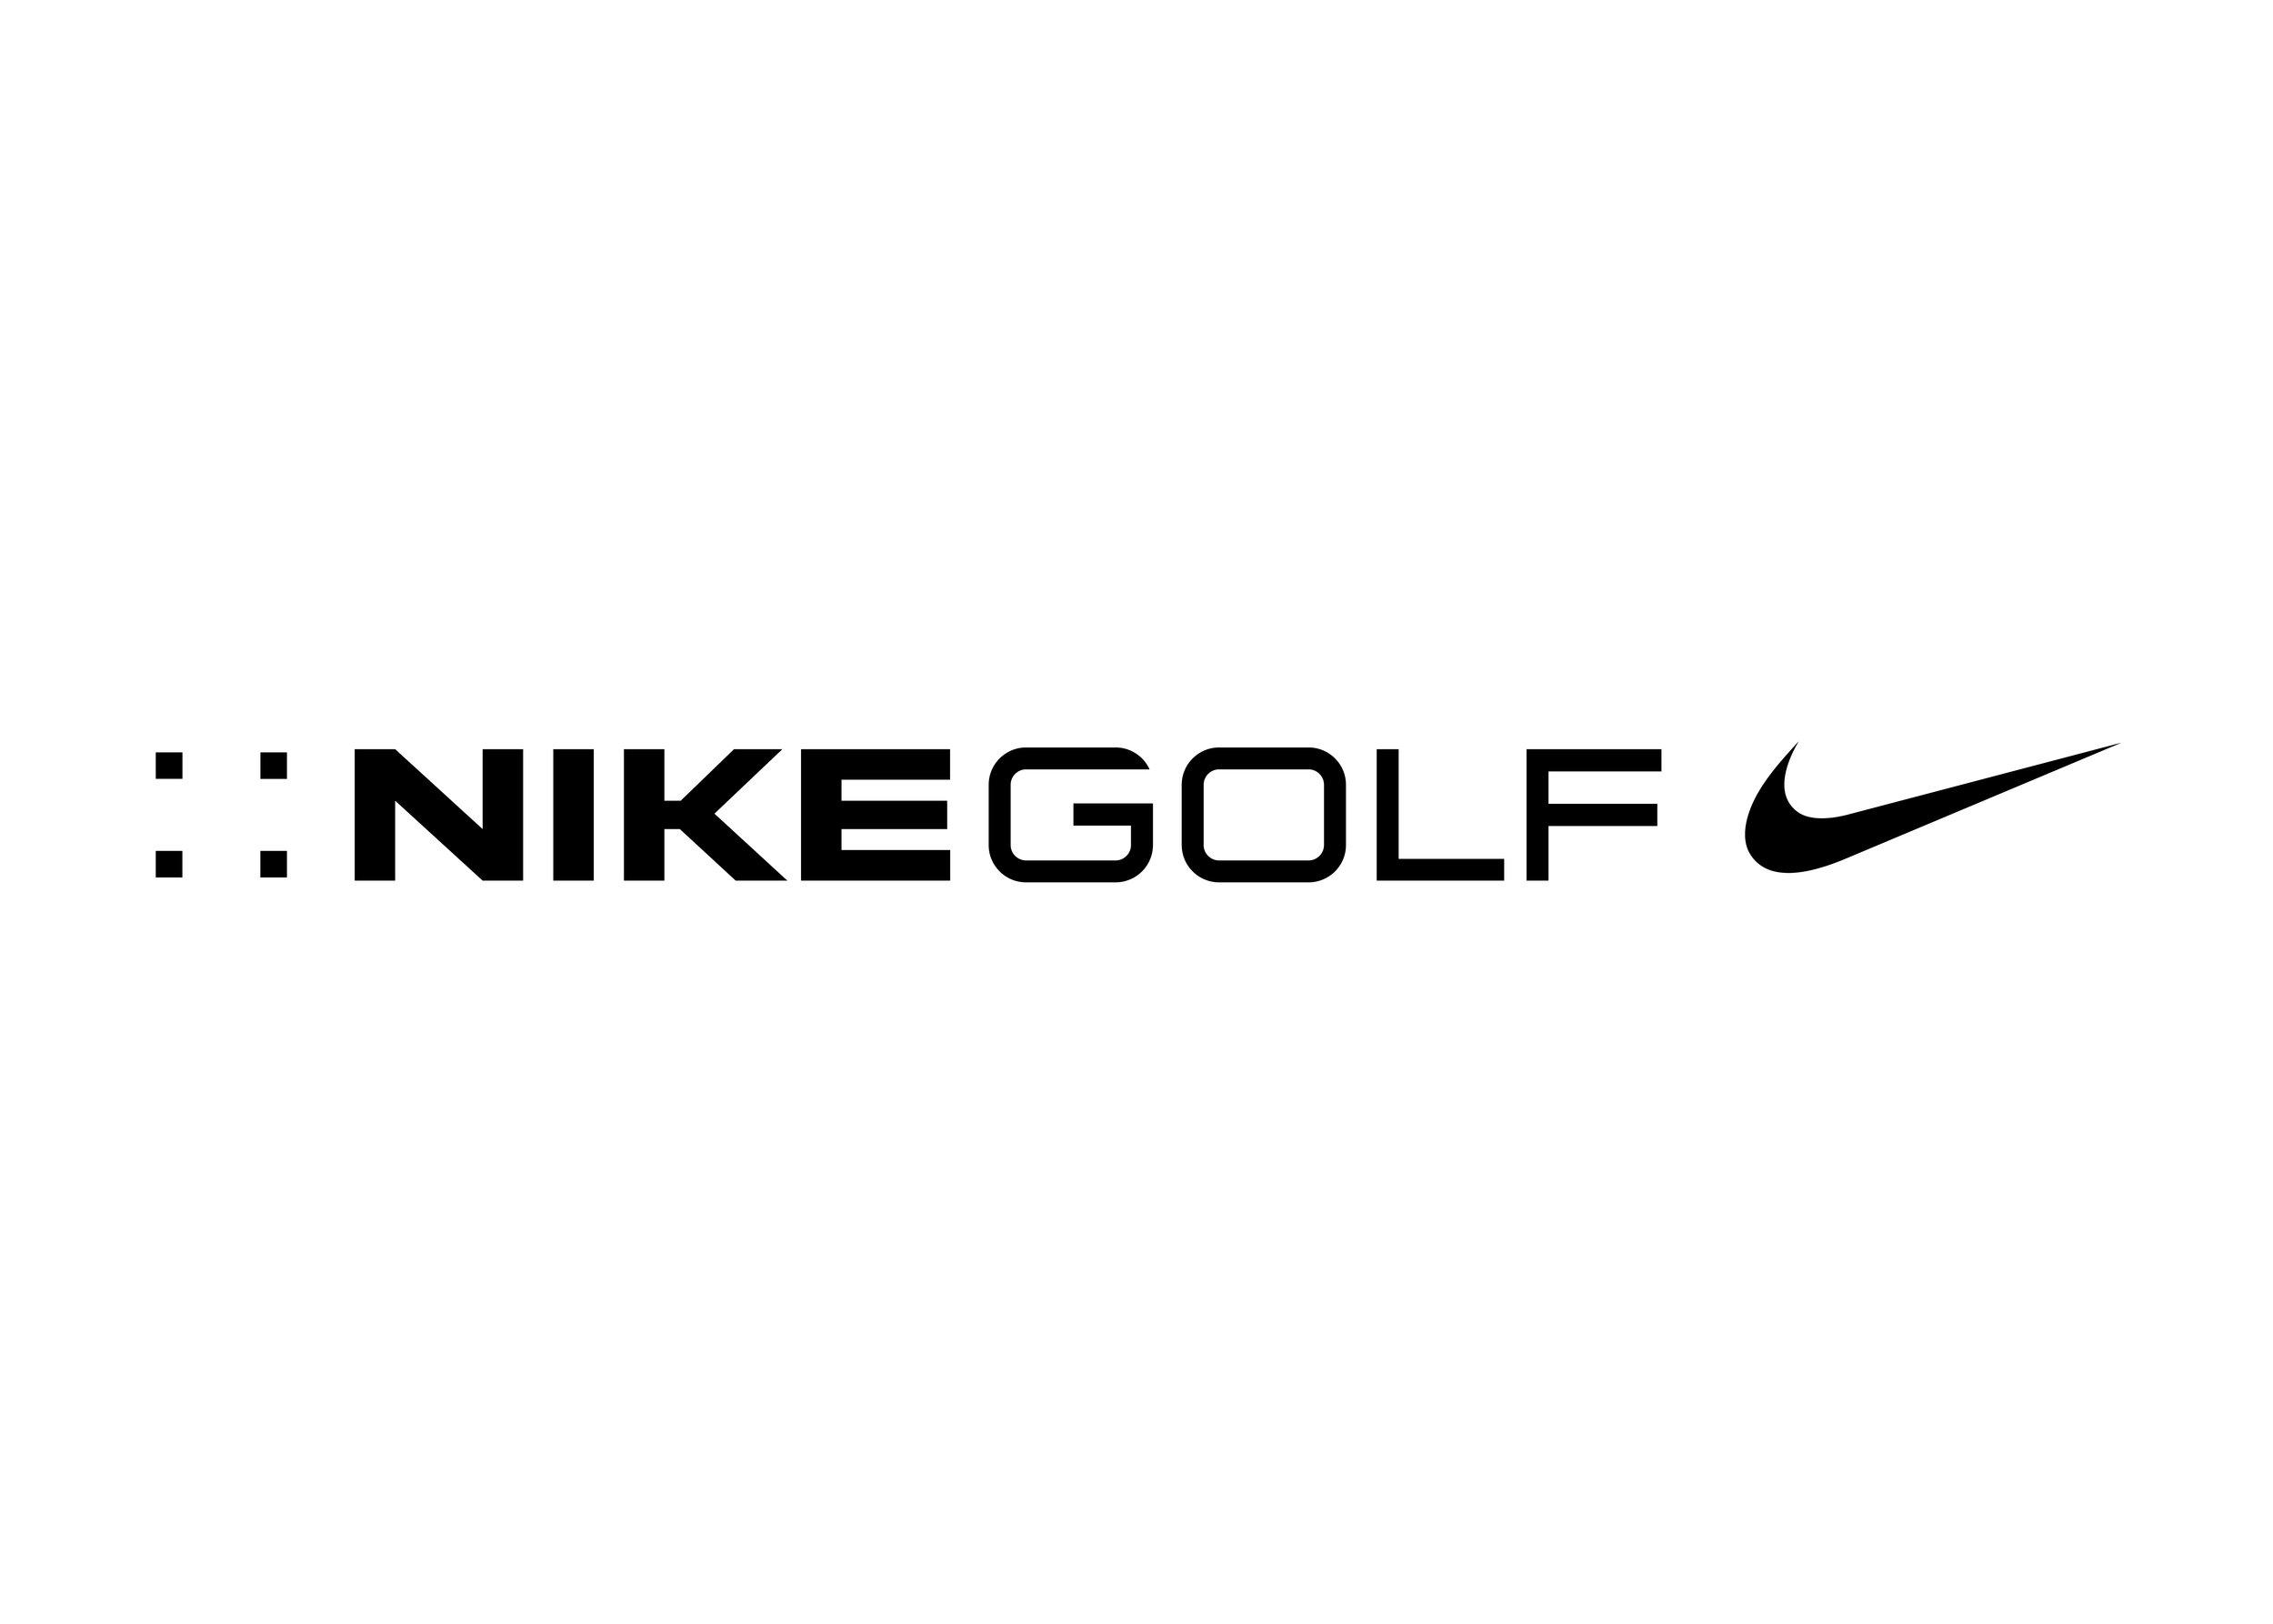 www.nike.com/us/en_us/c/golf